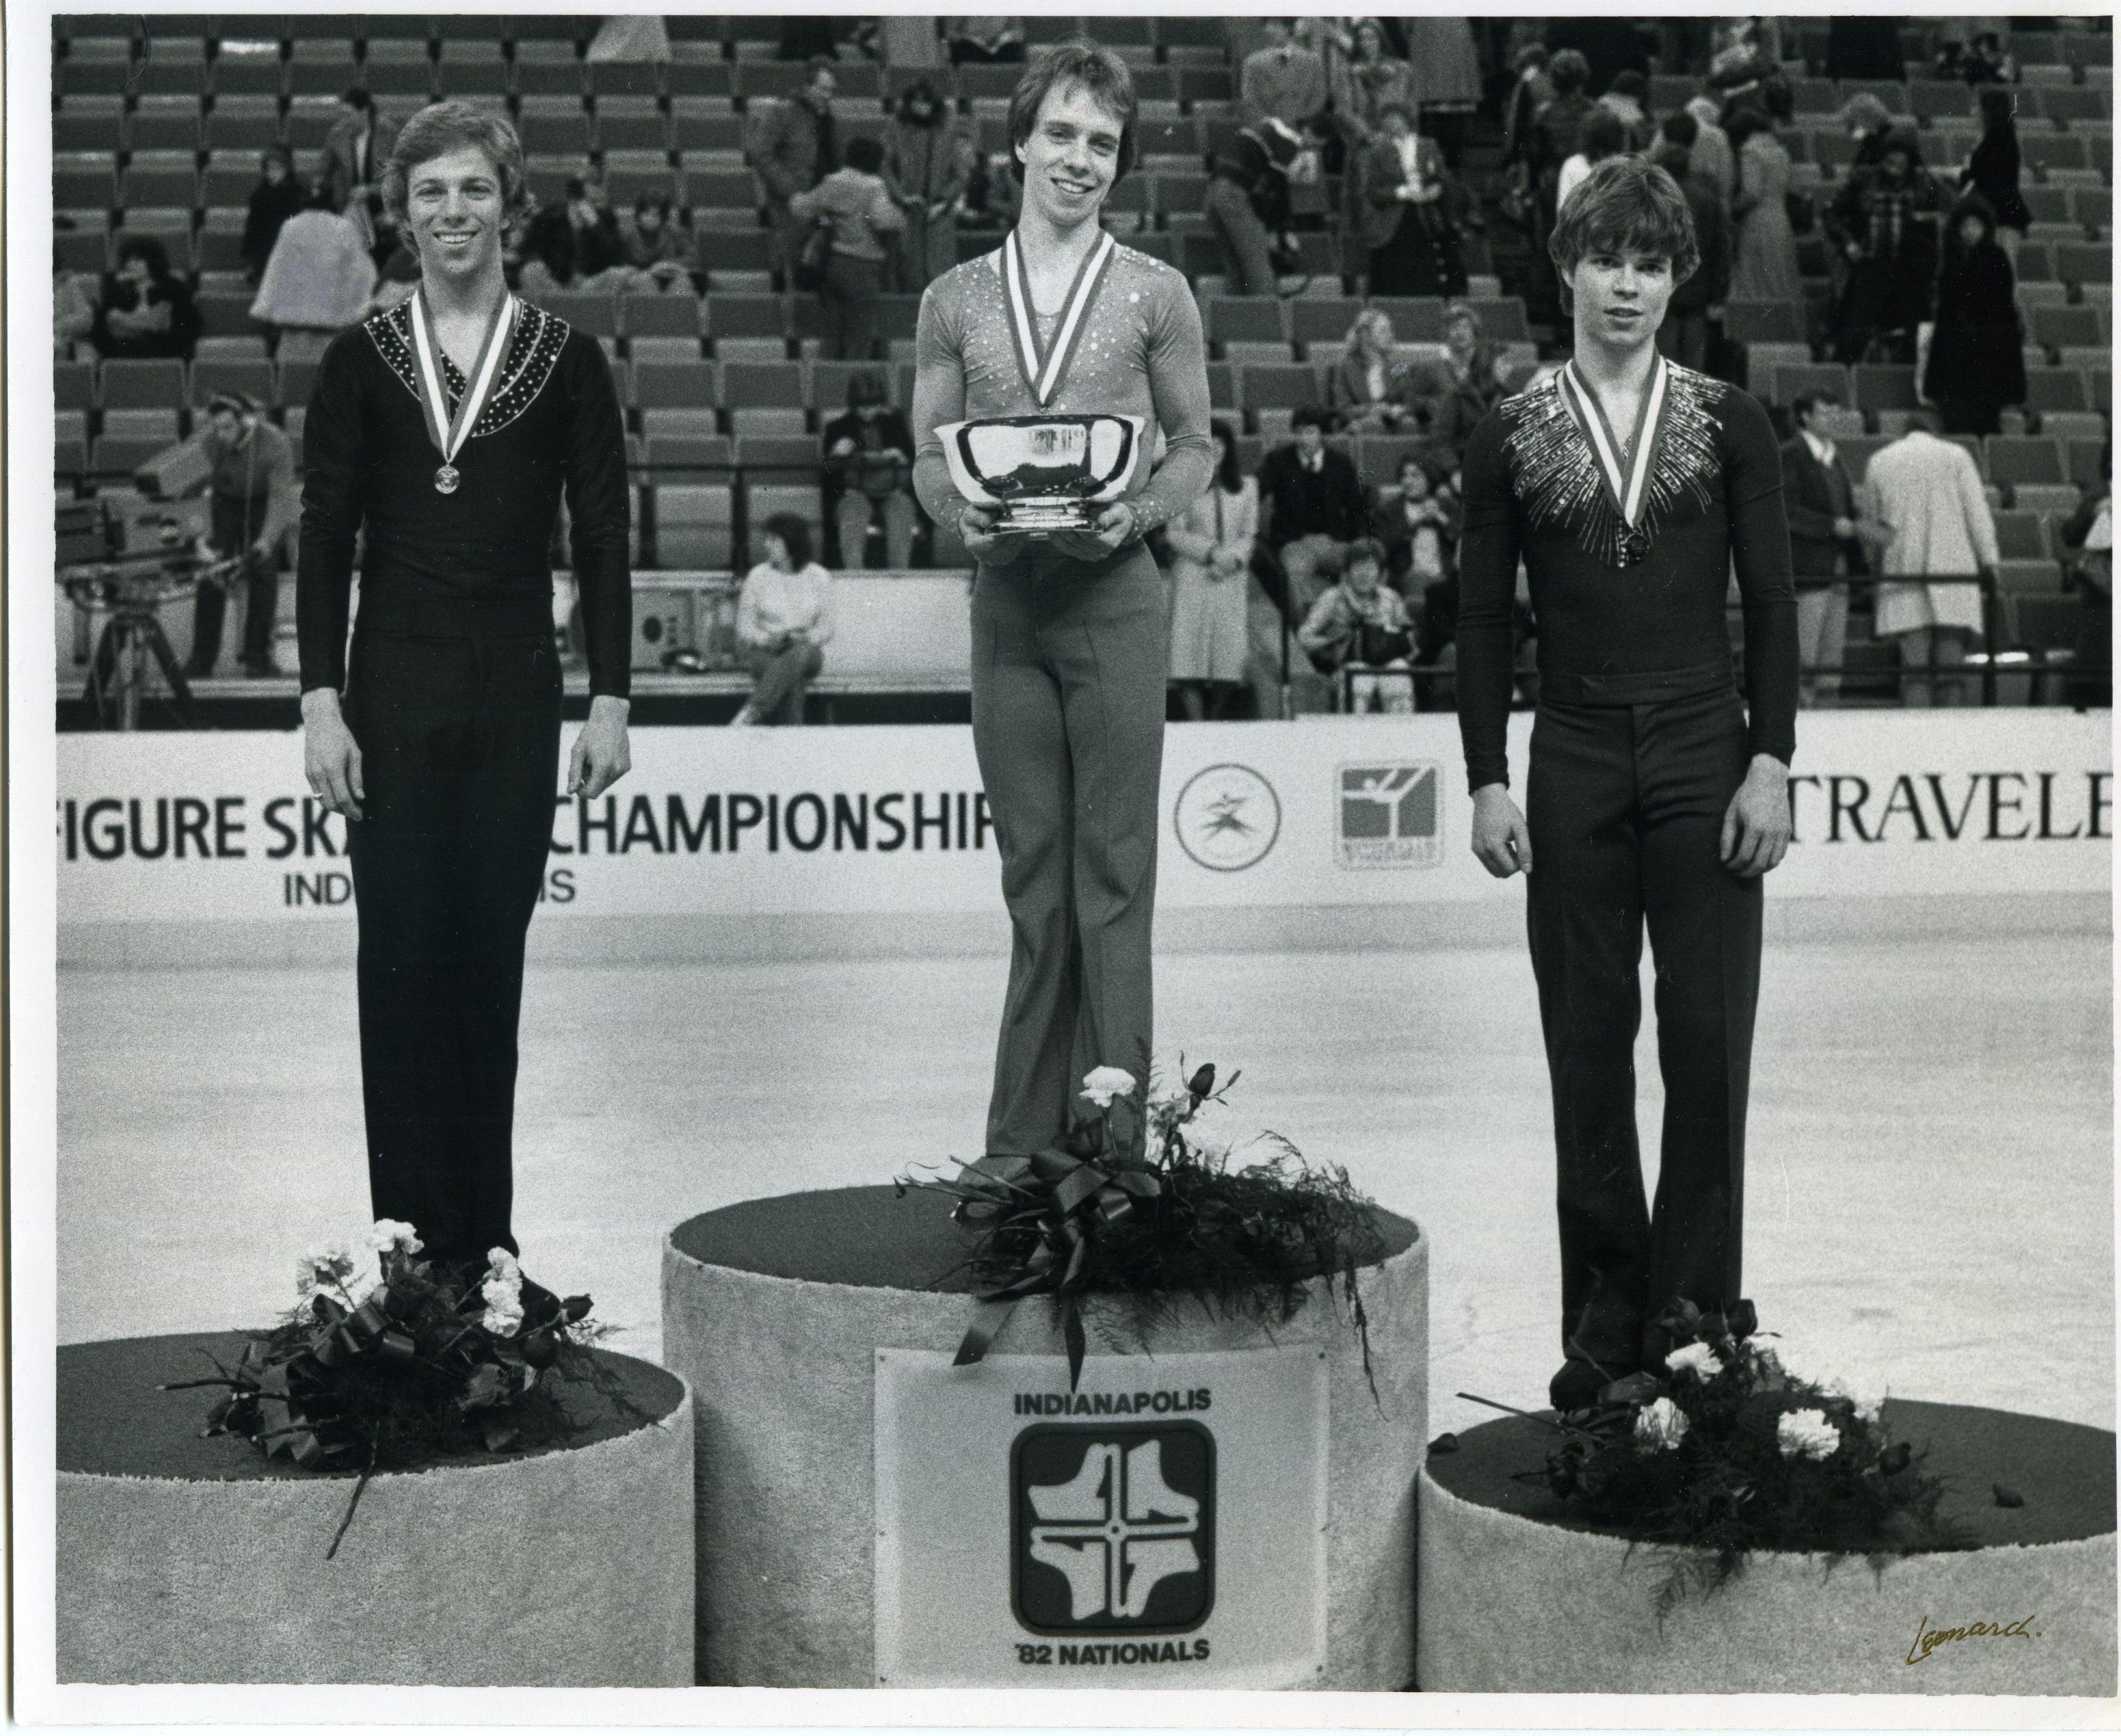 Scott Hamilton at 1982 Nationsl Podium image